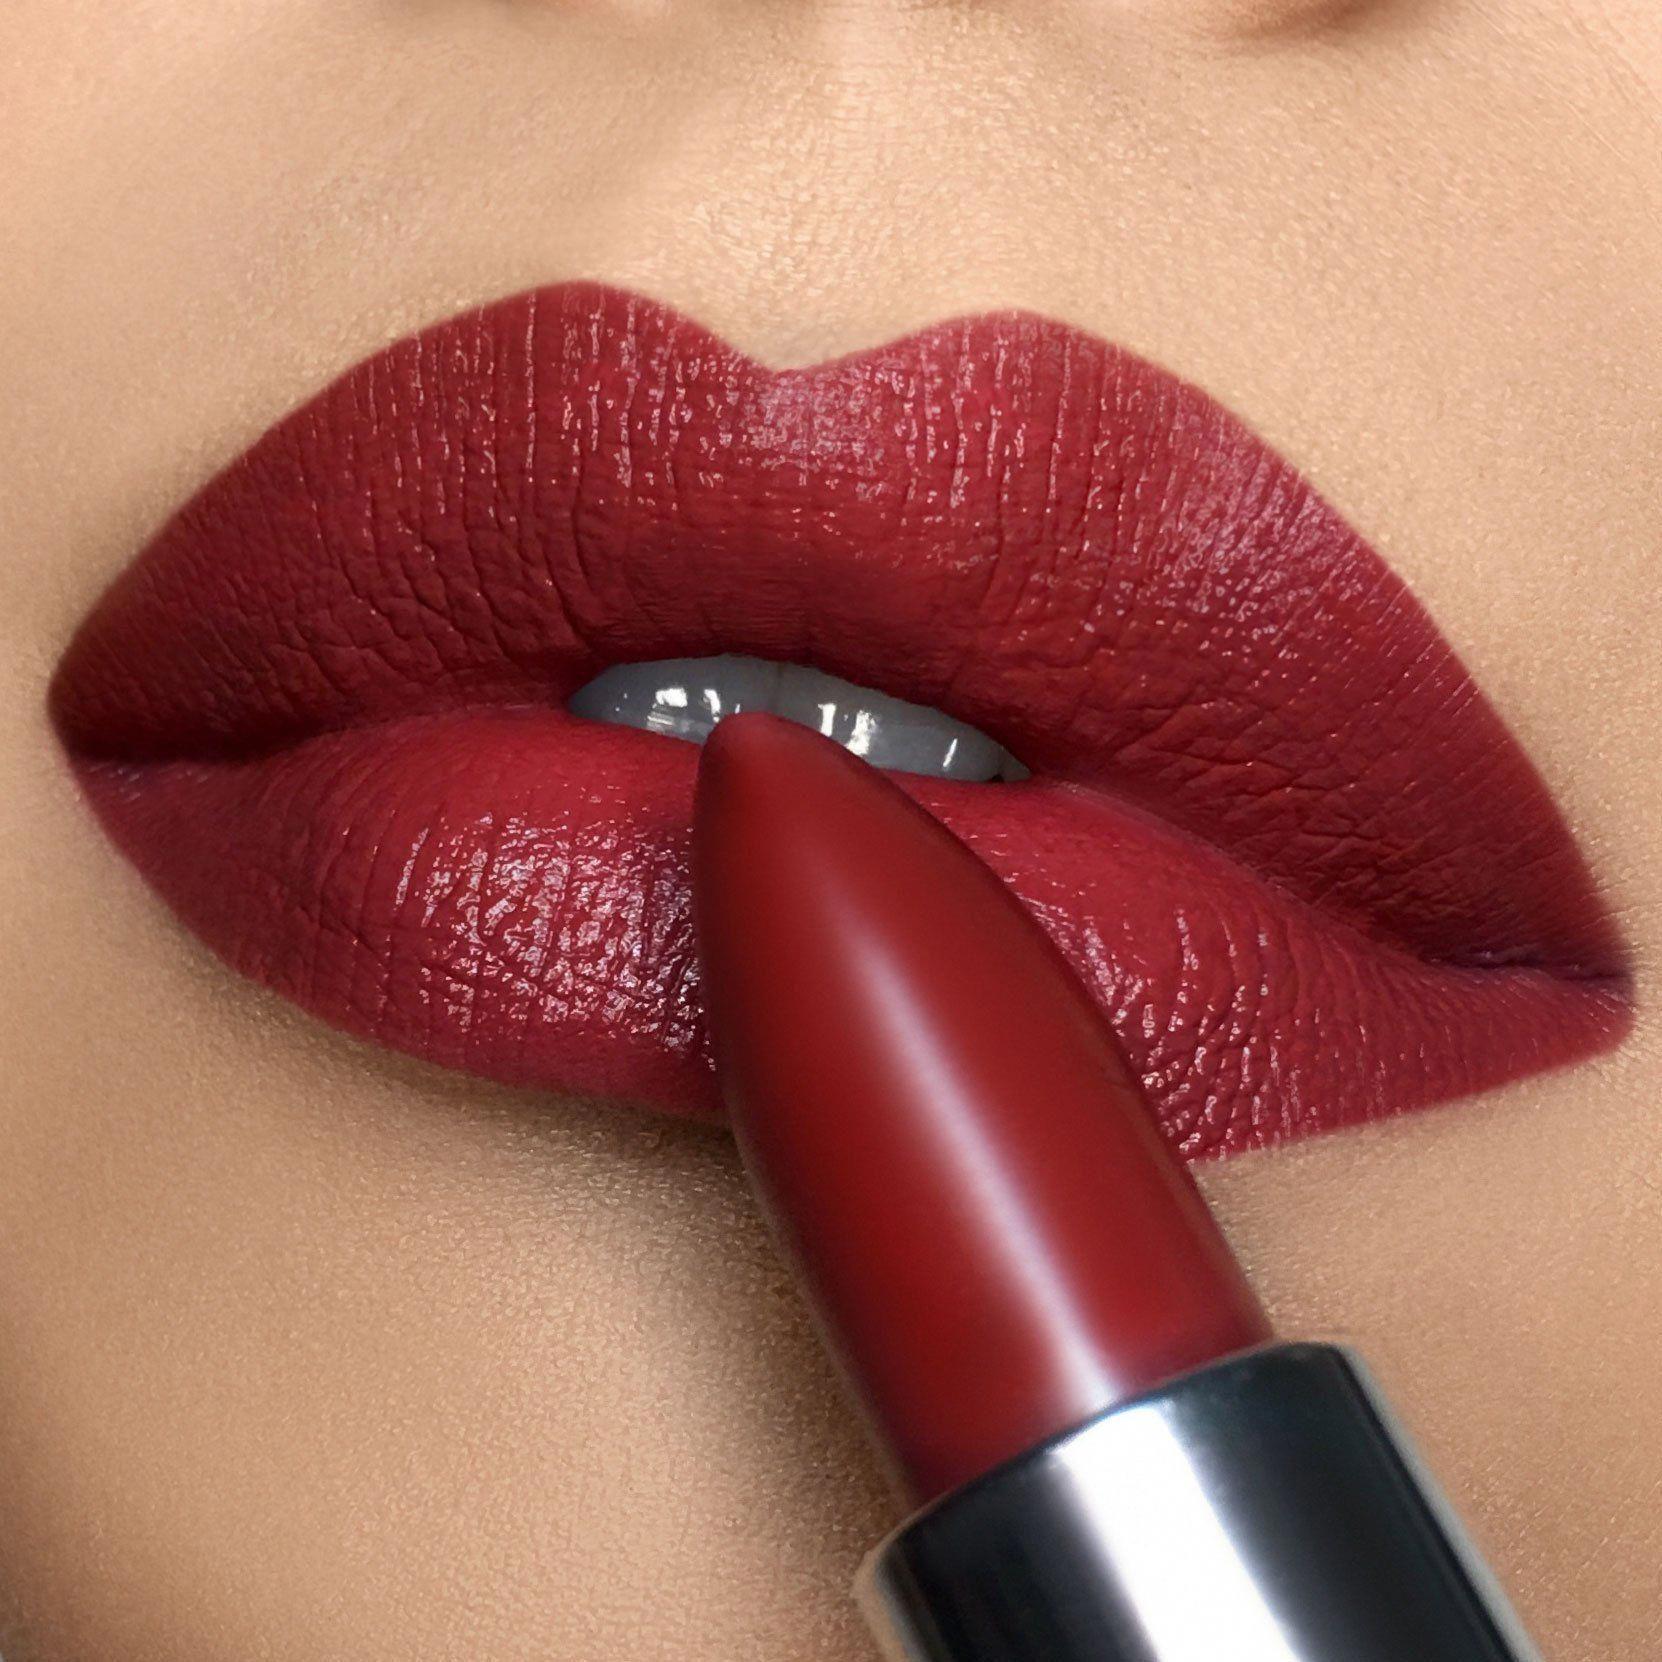 Clear Lip Gloss Olive Green Matte Lipstick Matte Glossy